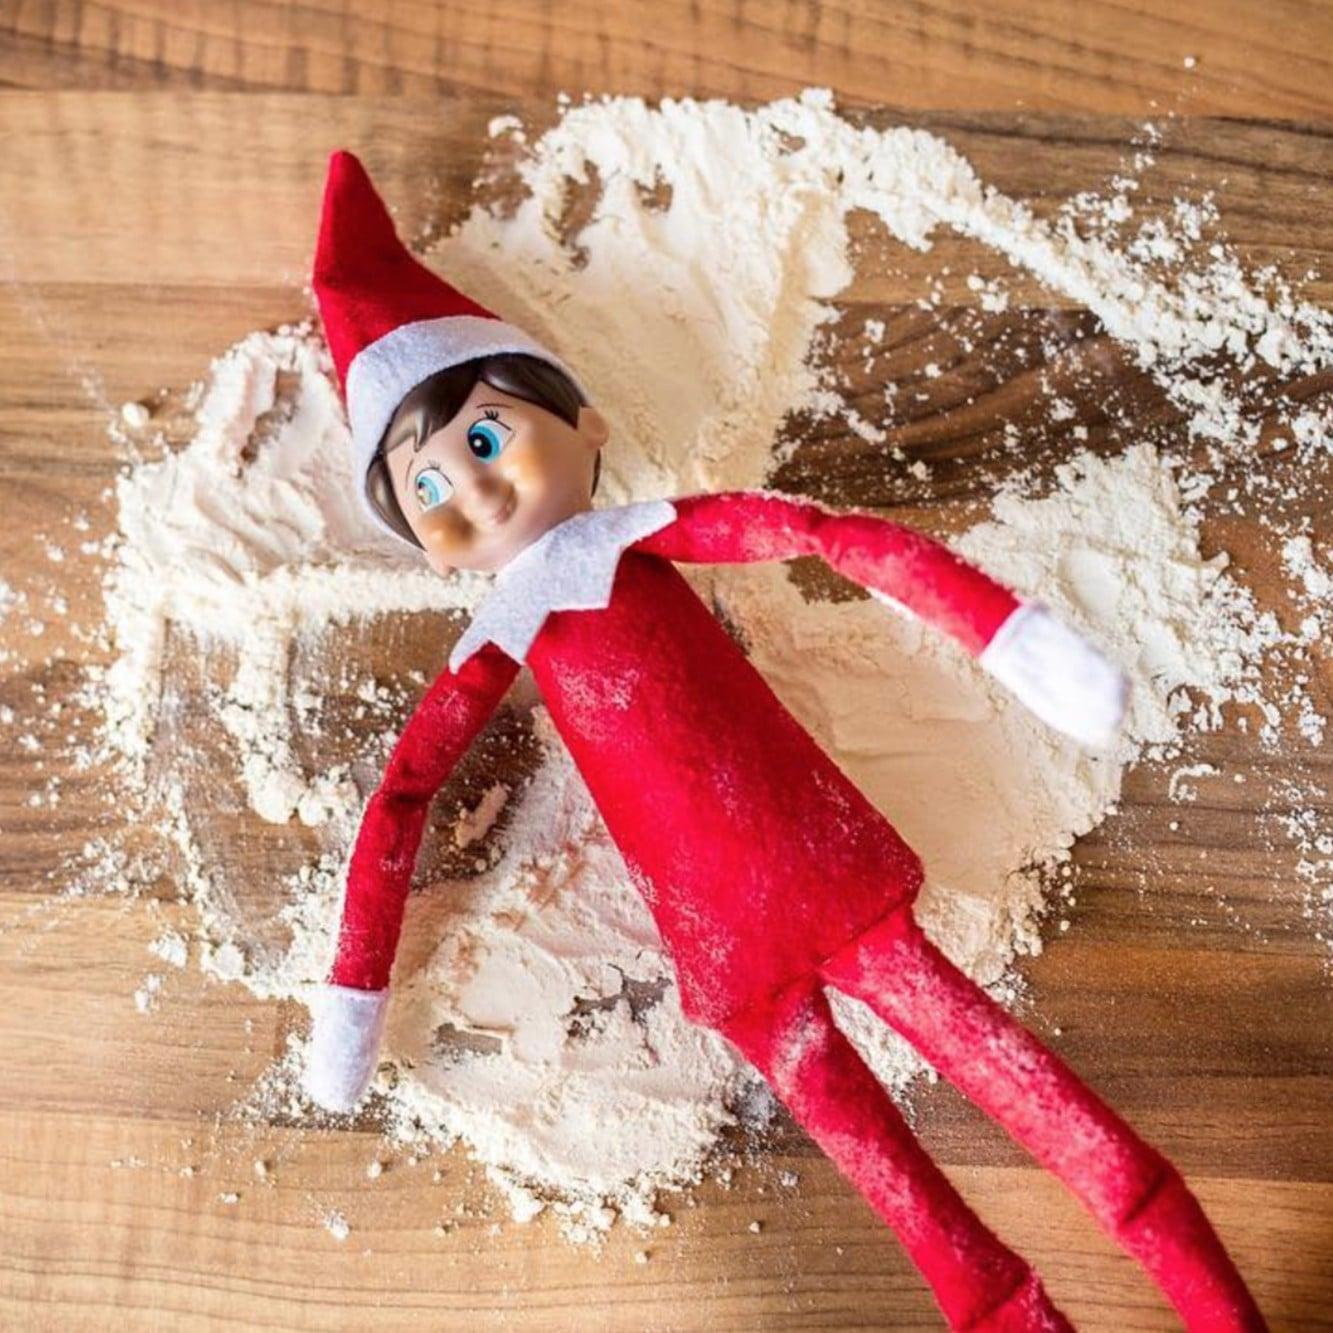 Christmas Elf On The Shelf Images.Last Minute Elf On The Shelf Ideas Popsugar Family